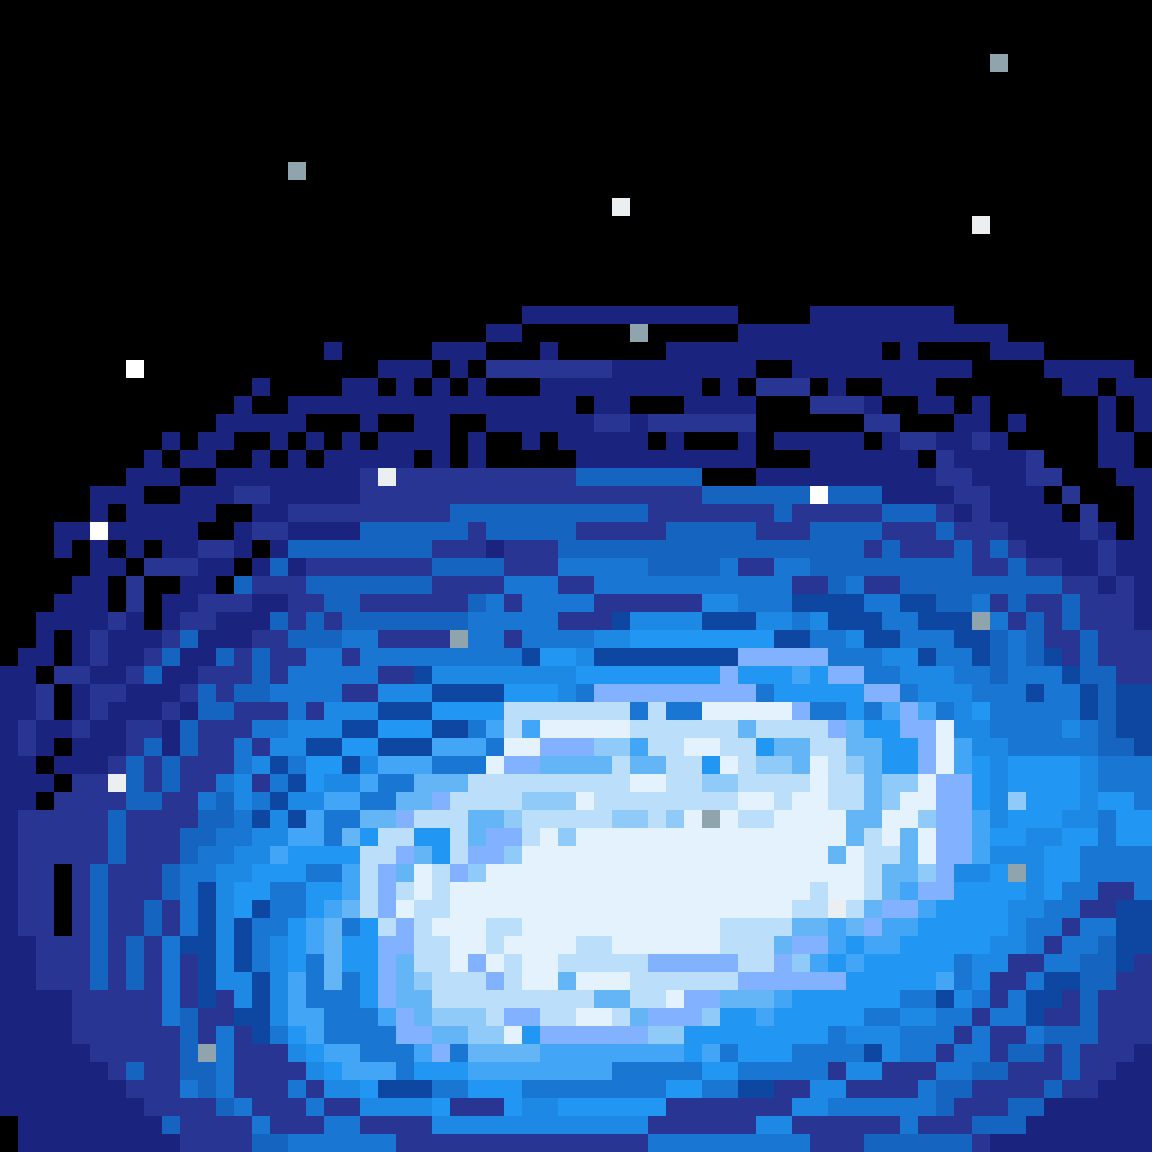 Galaxy by Kikilovetodance